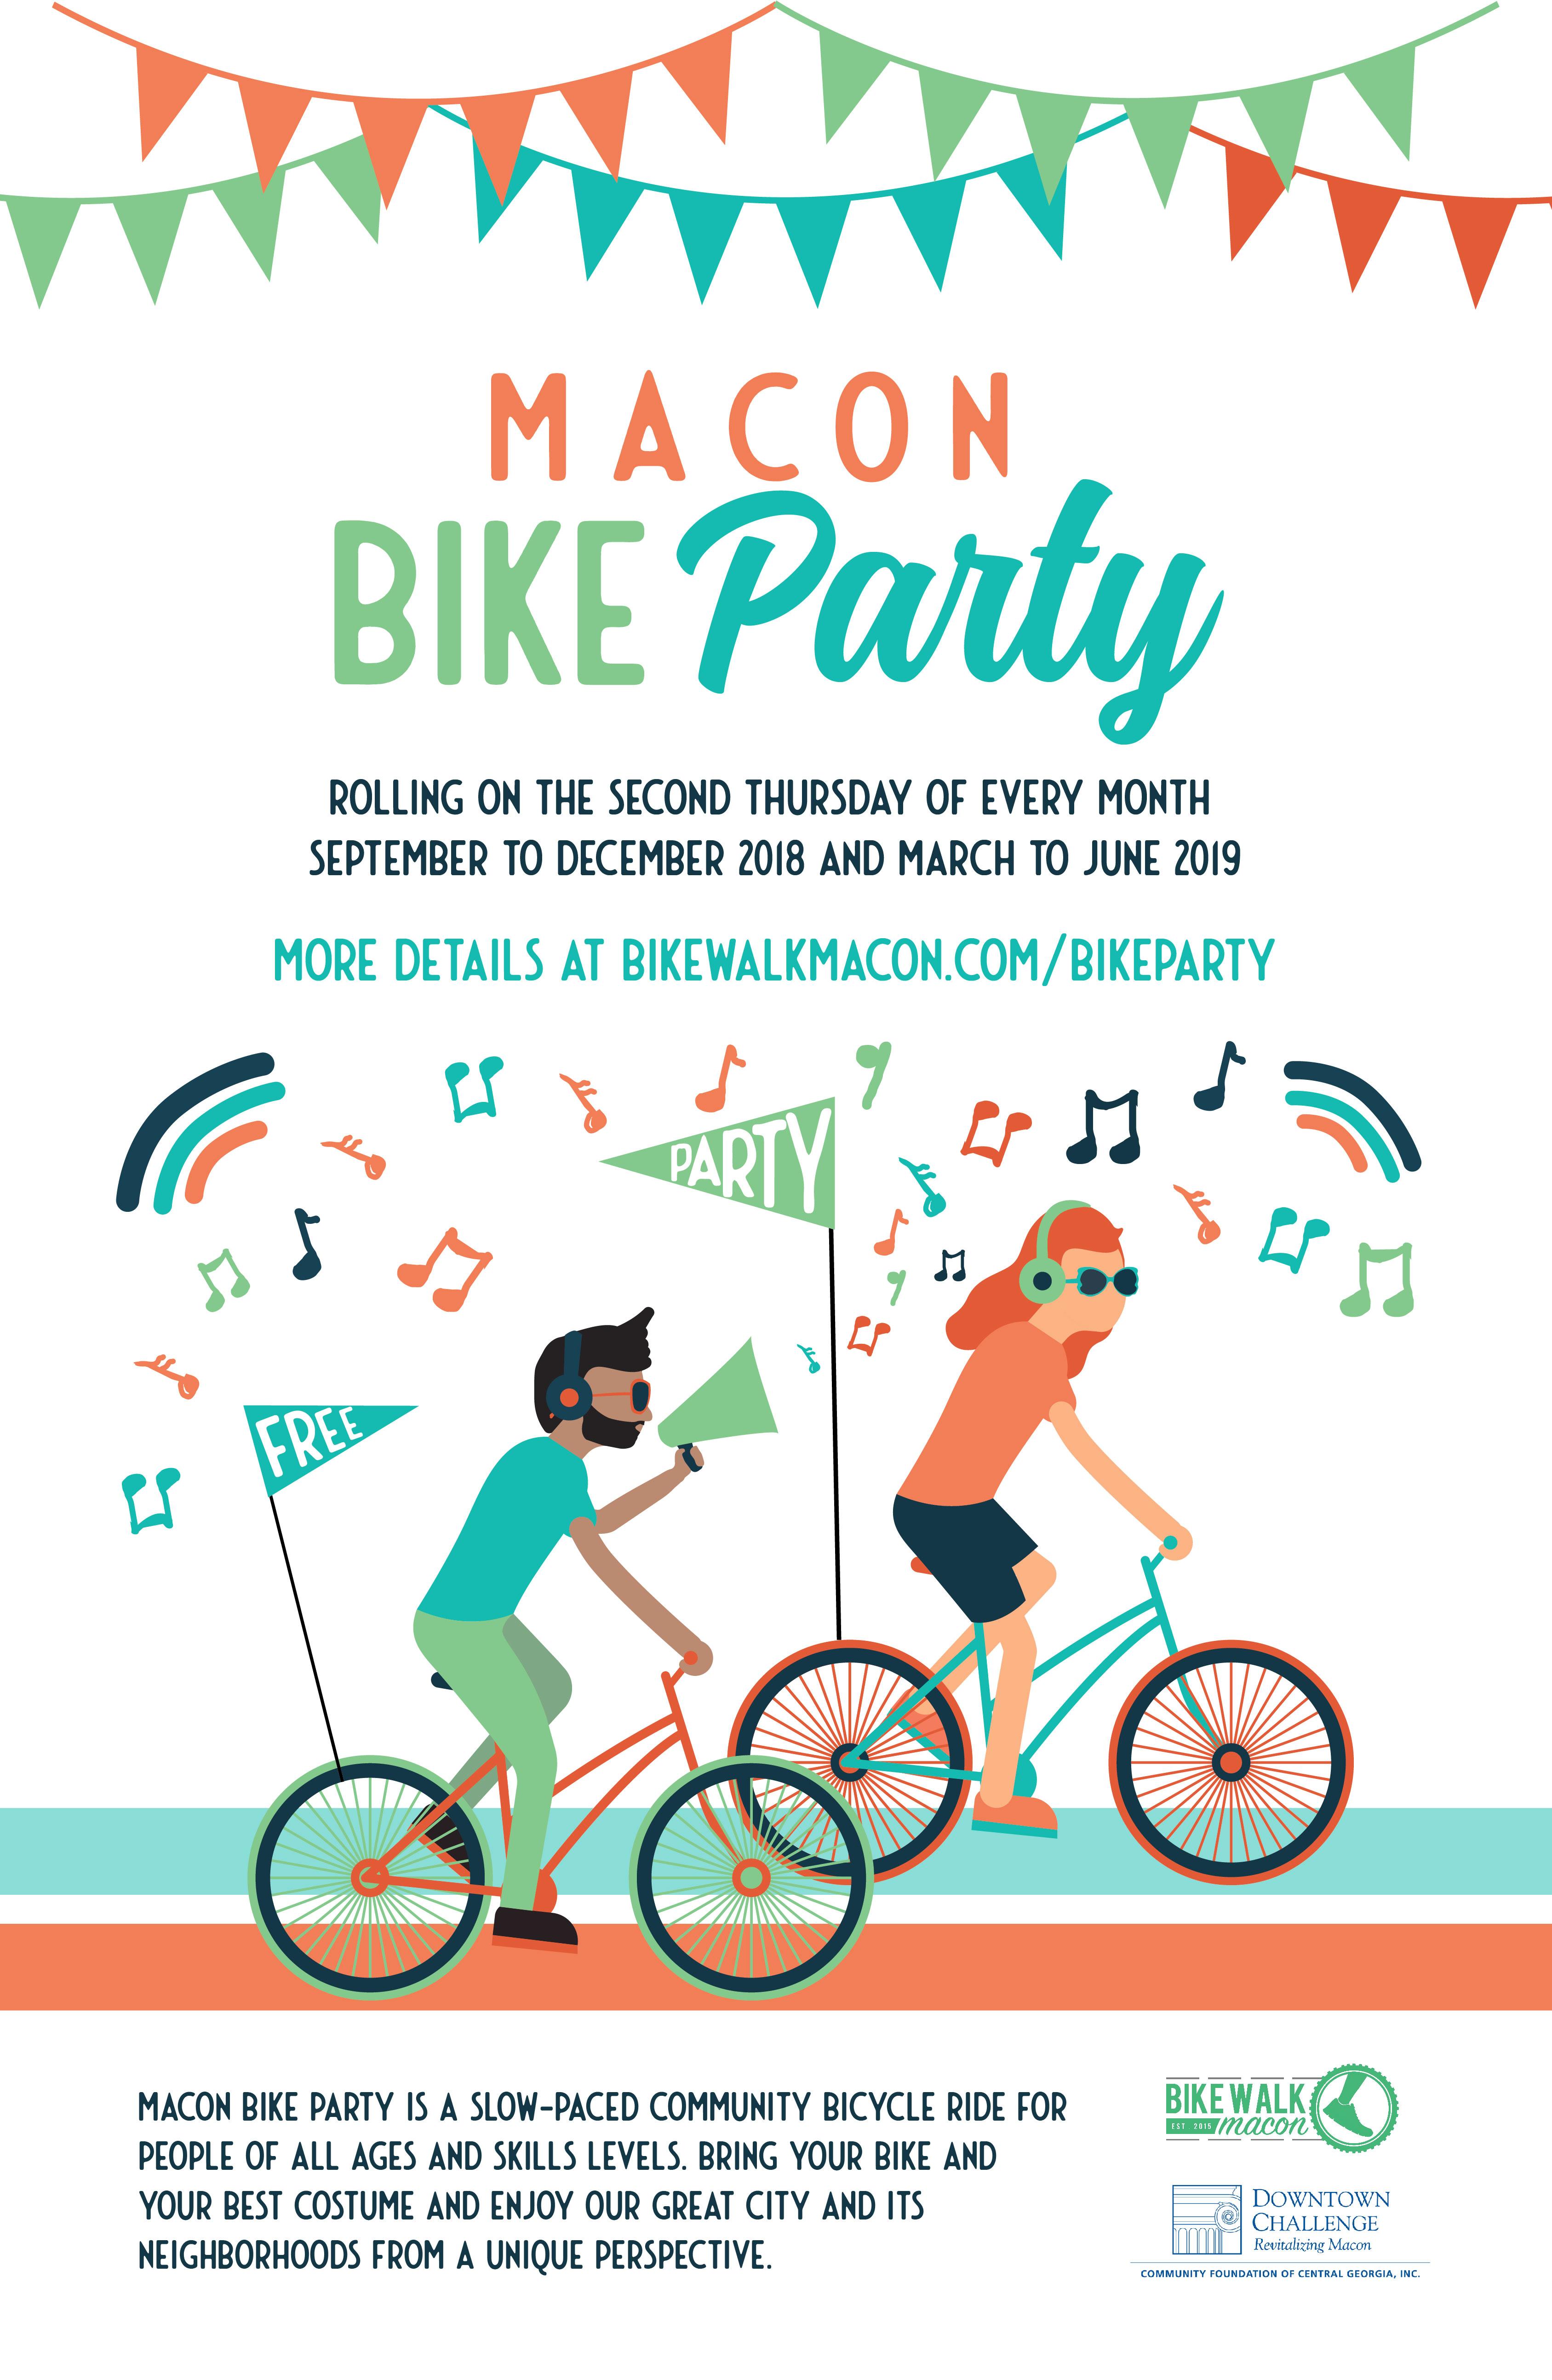 Macon Bike Party flyer design isolated on white for Bike Walk Macon